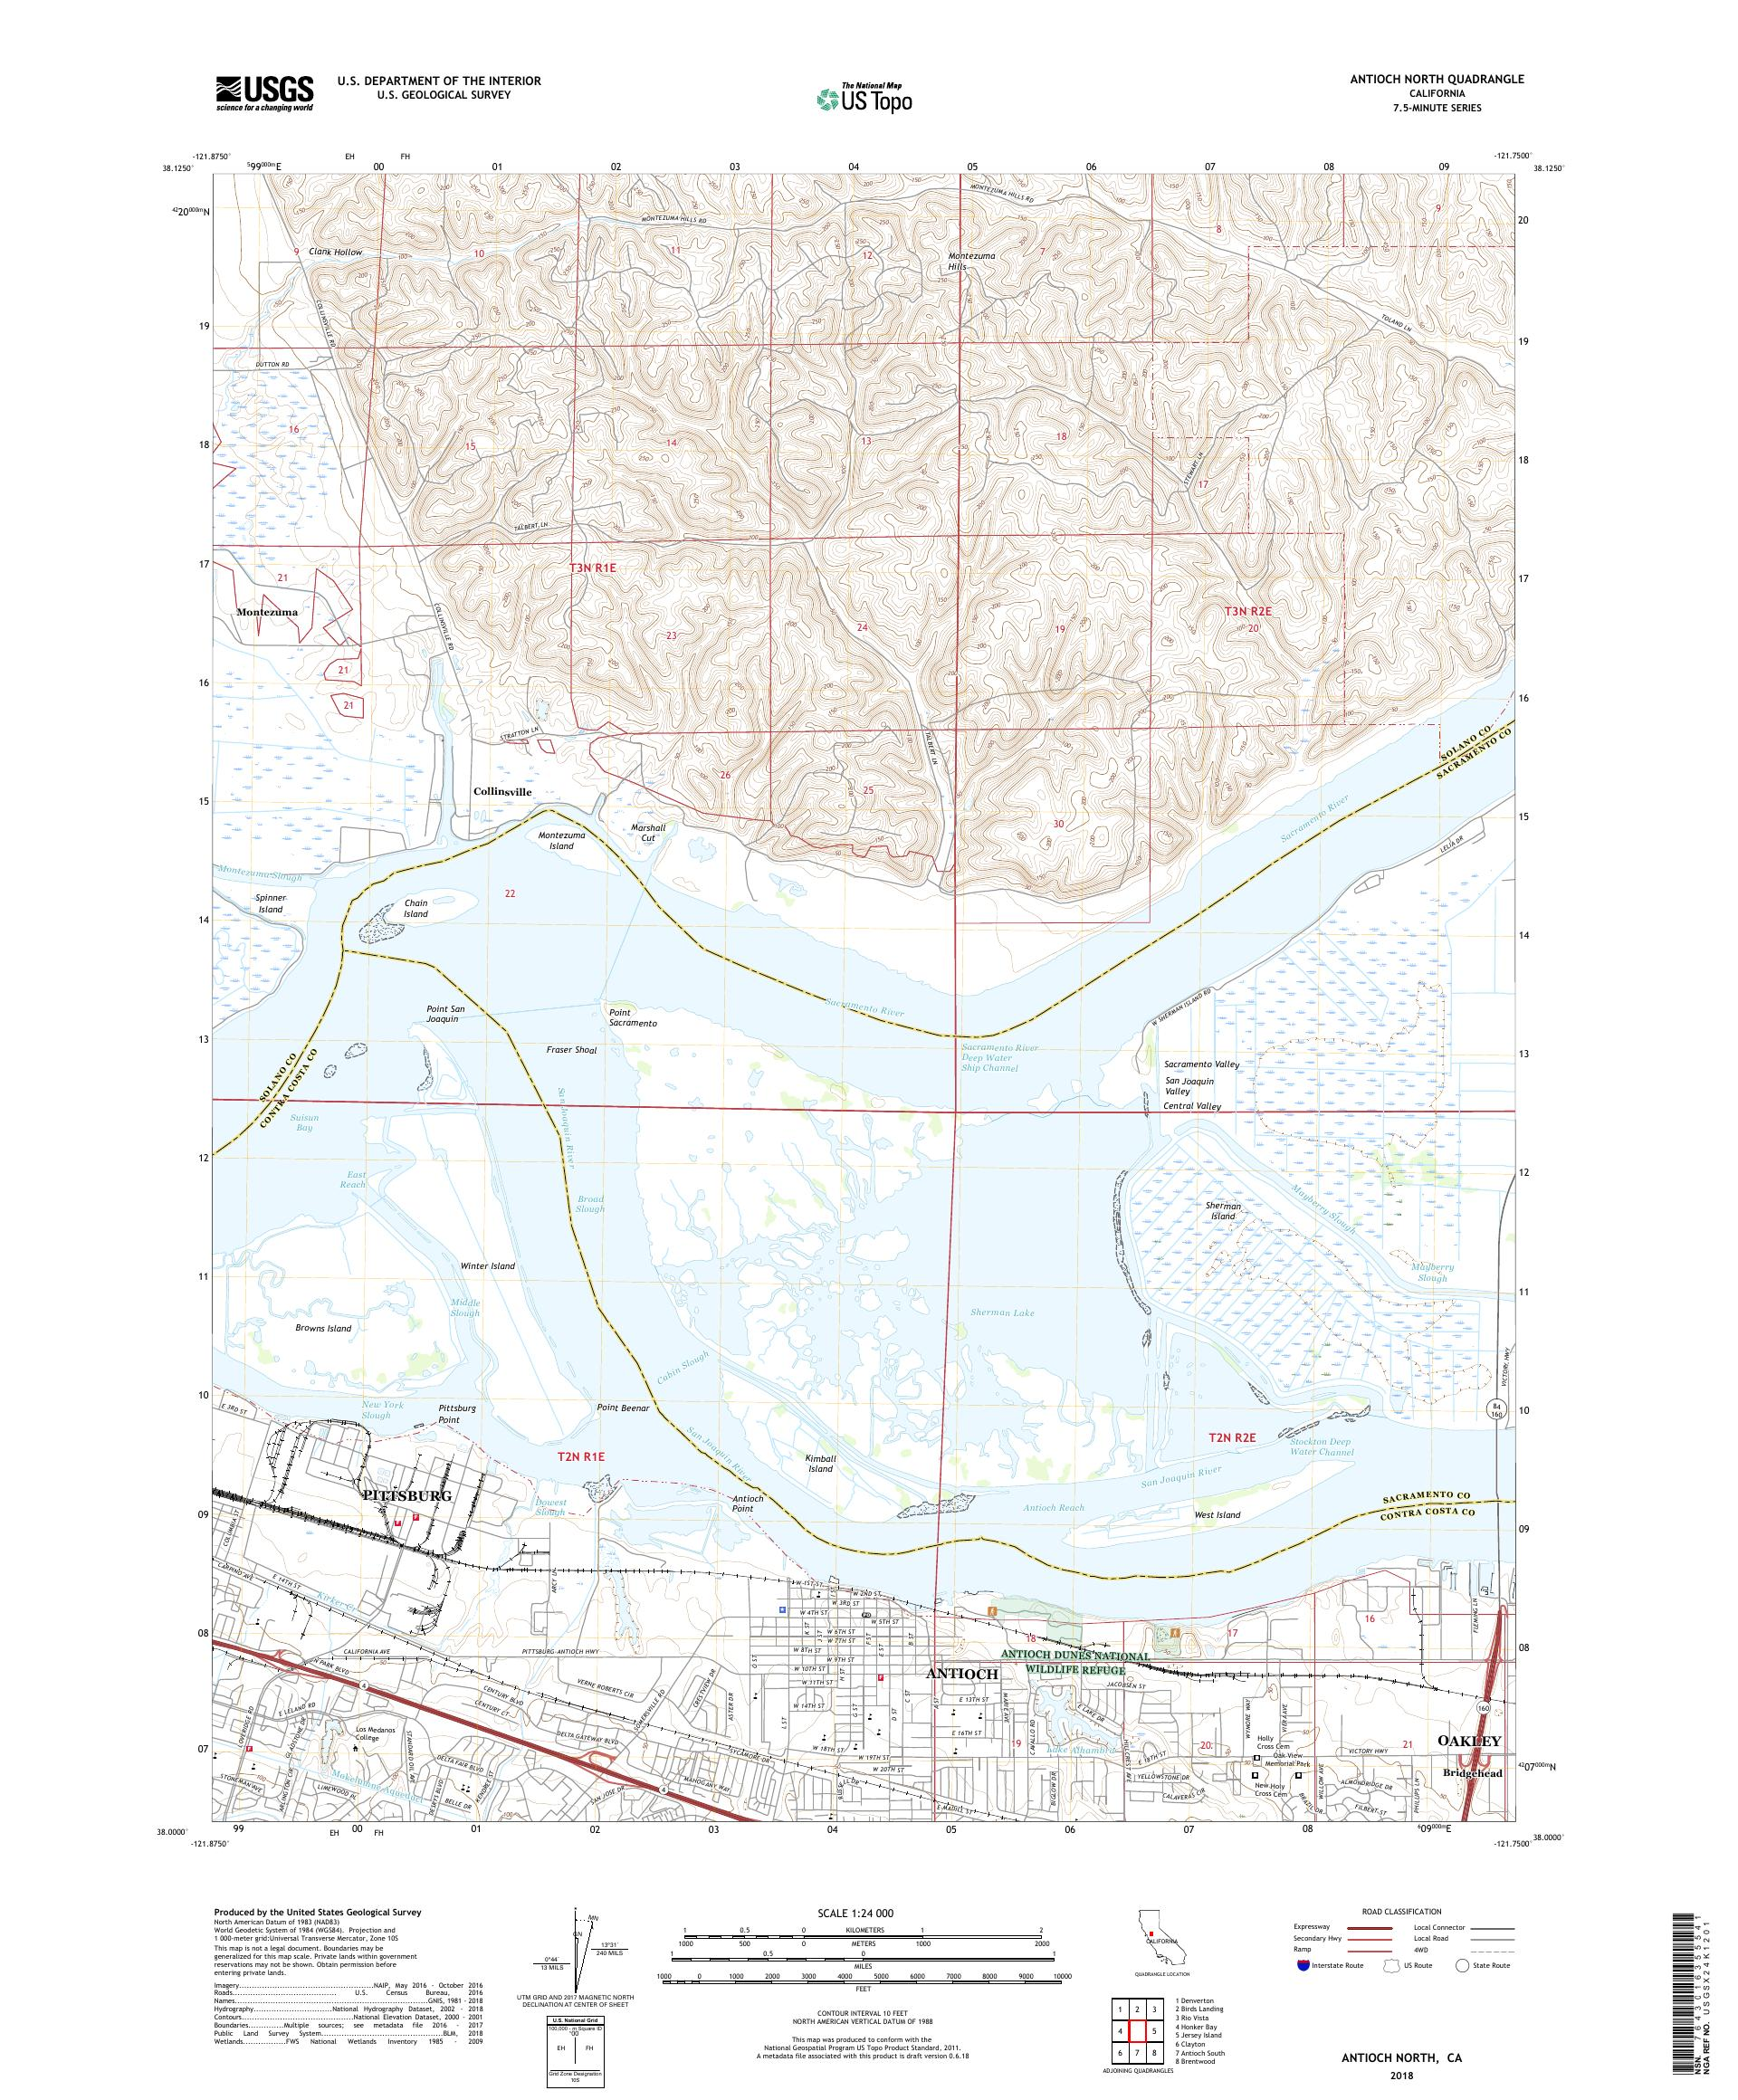 MyTopo Antioch North, California USGS Quad Topo Map